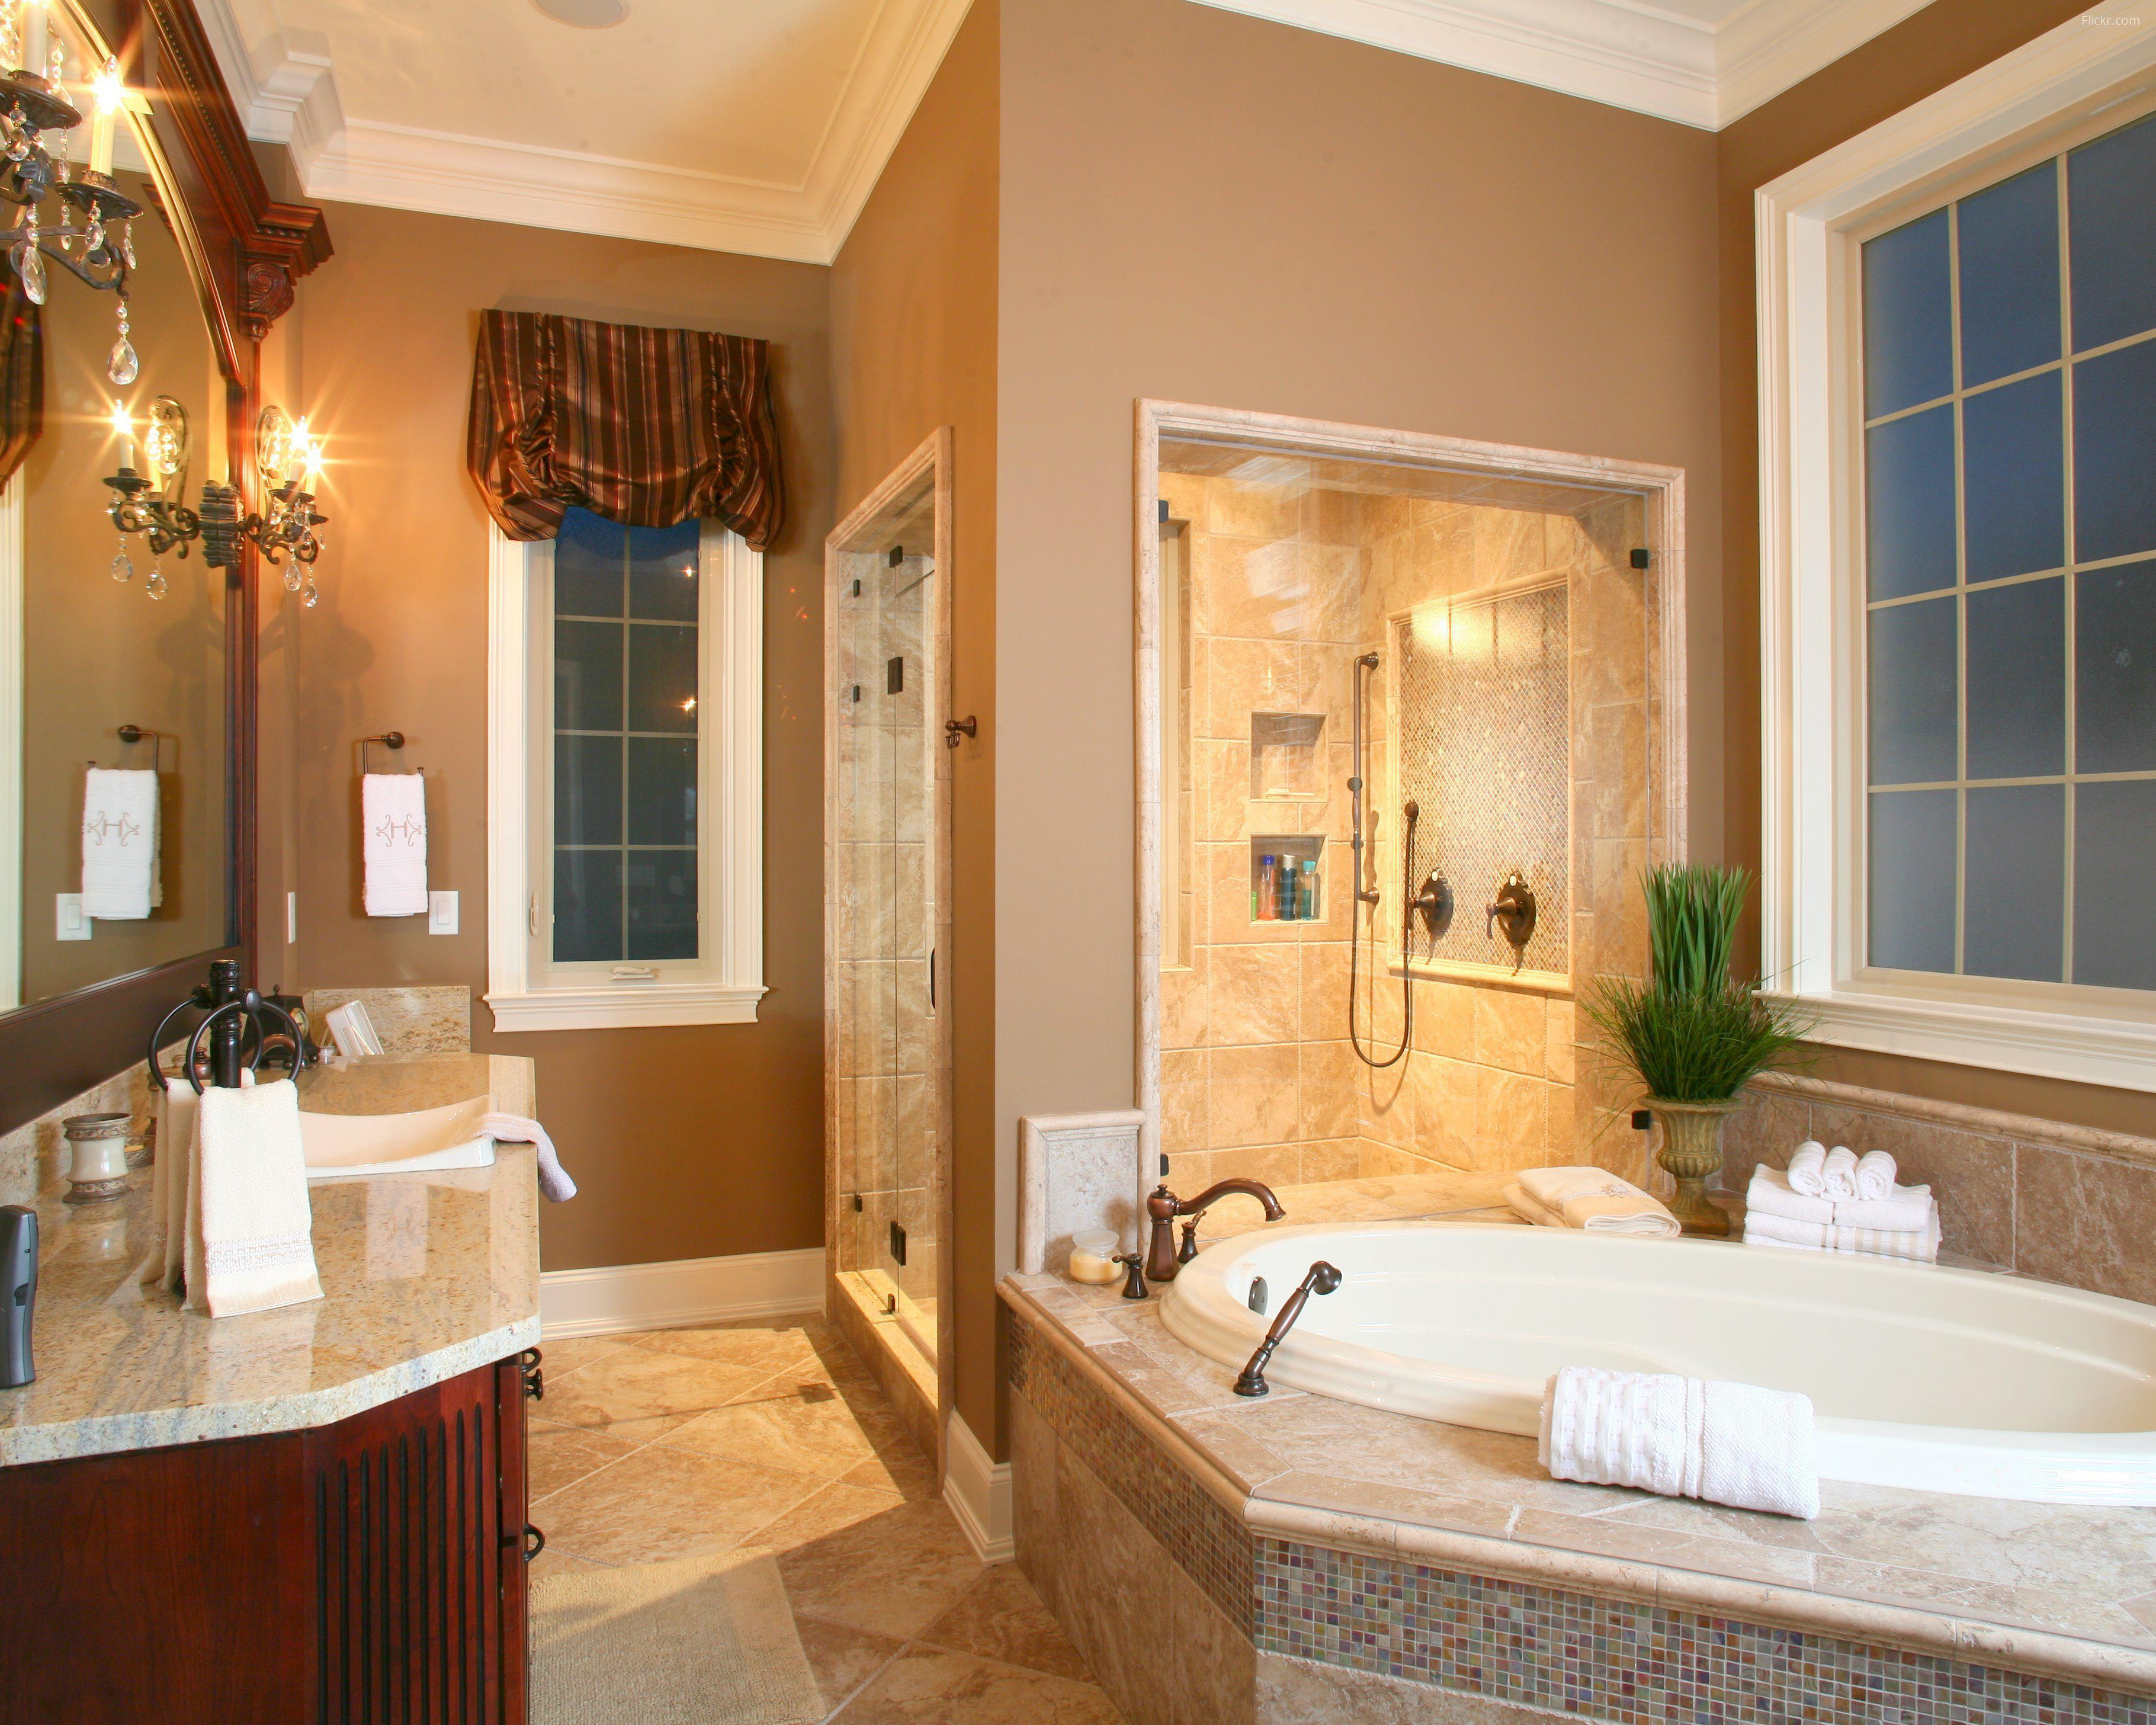 Gy ny r f rd inspir ci t r for Bathroom interior design tumblr